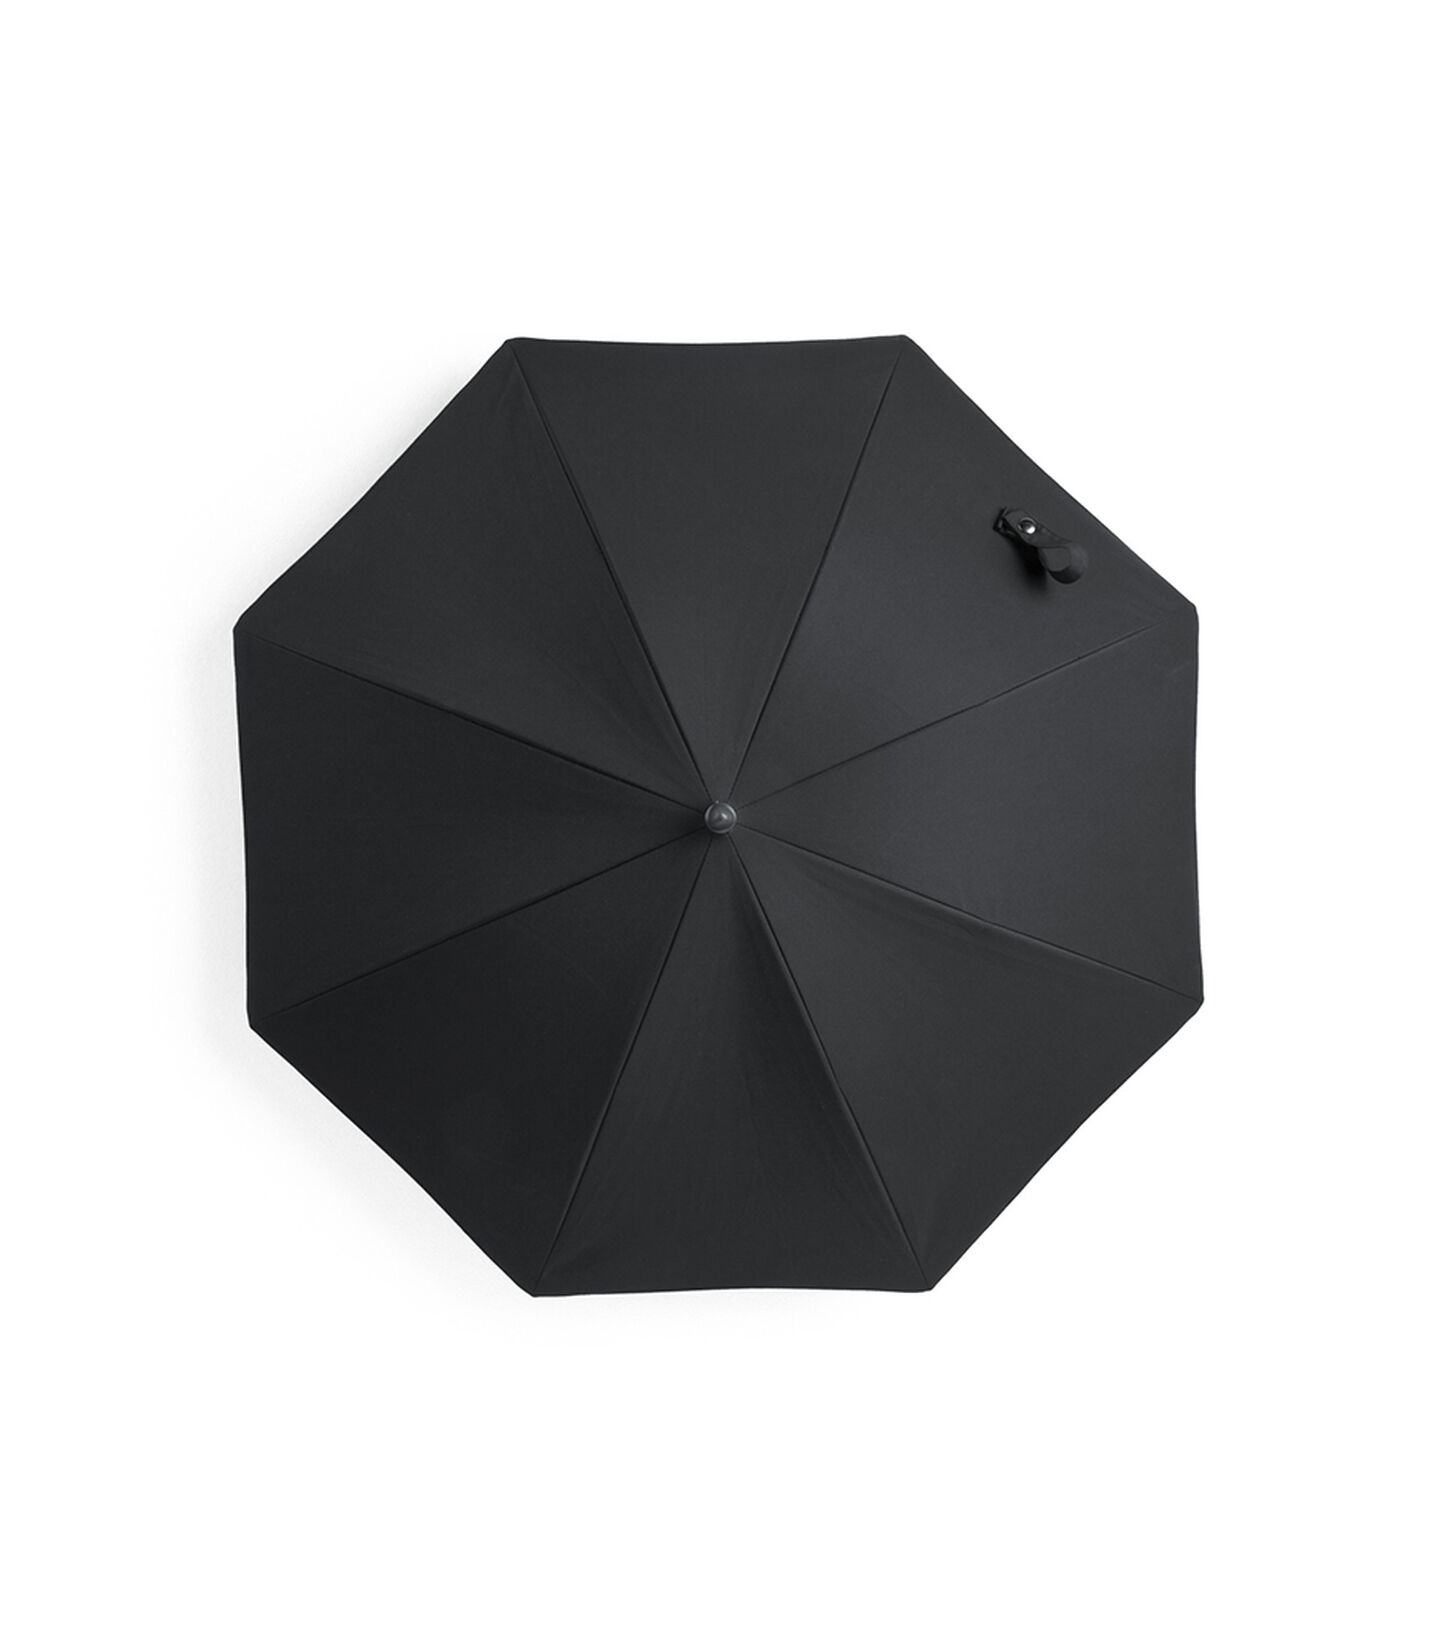 Stokke® Stroller Black Parasol Black, Noir, mainview view 2